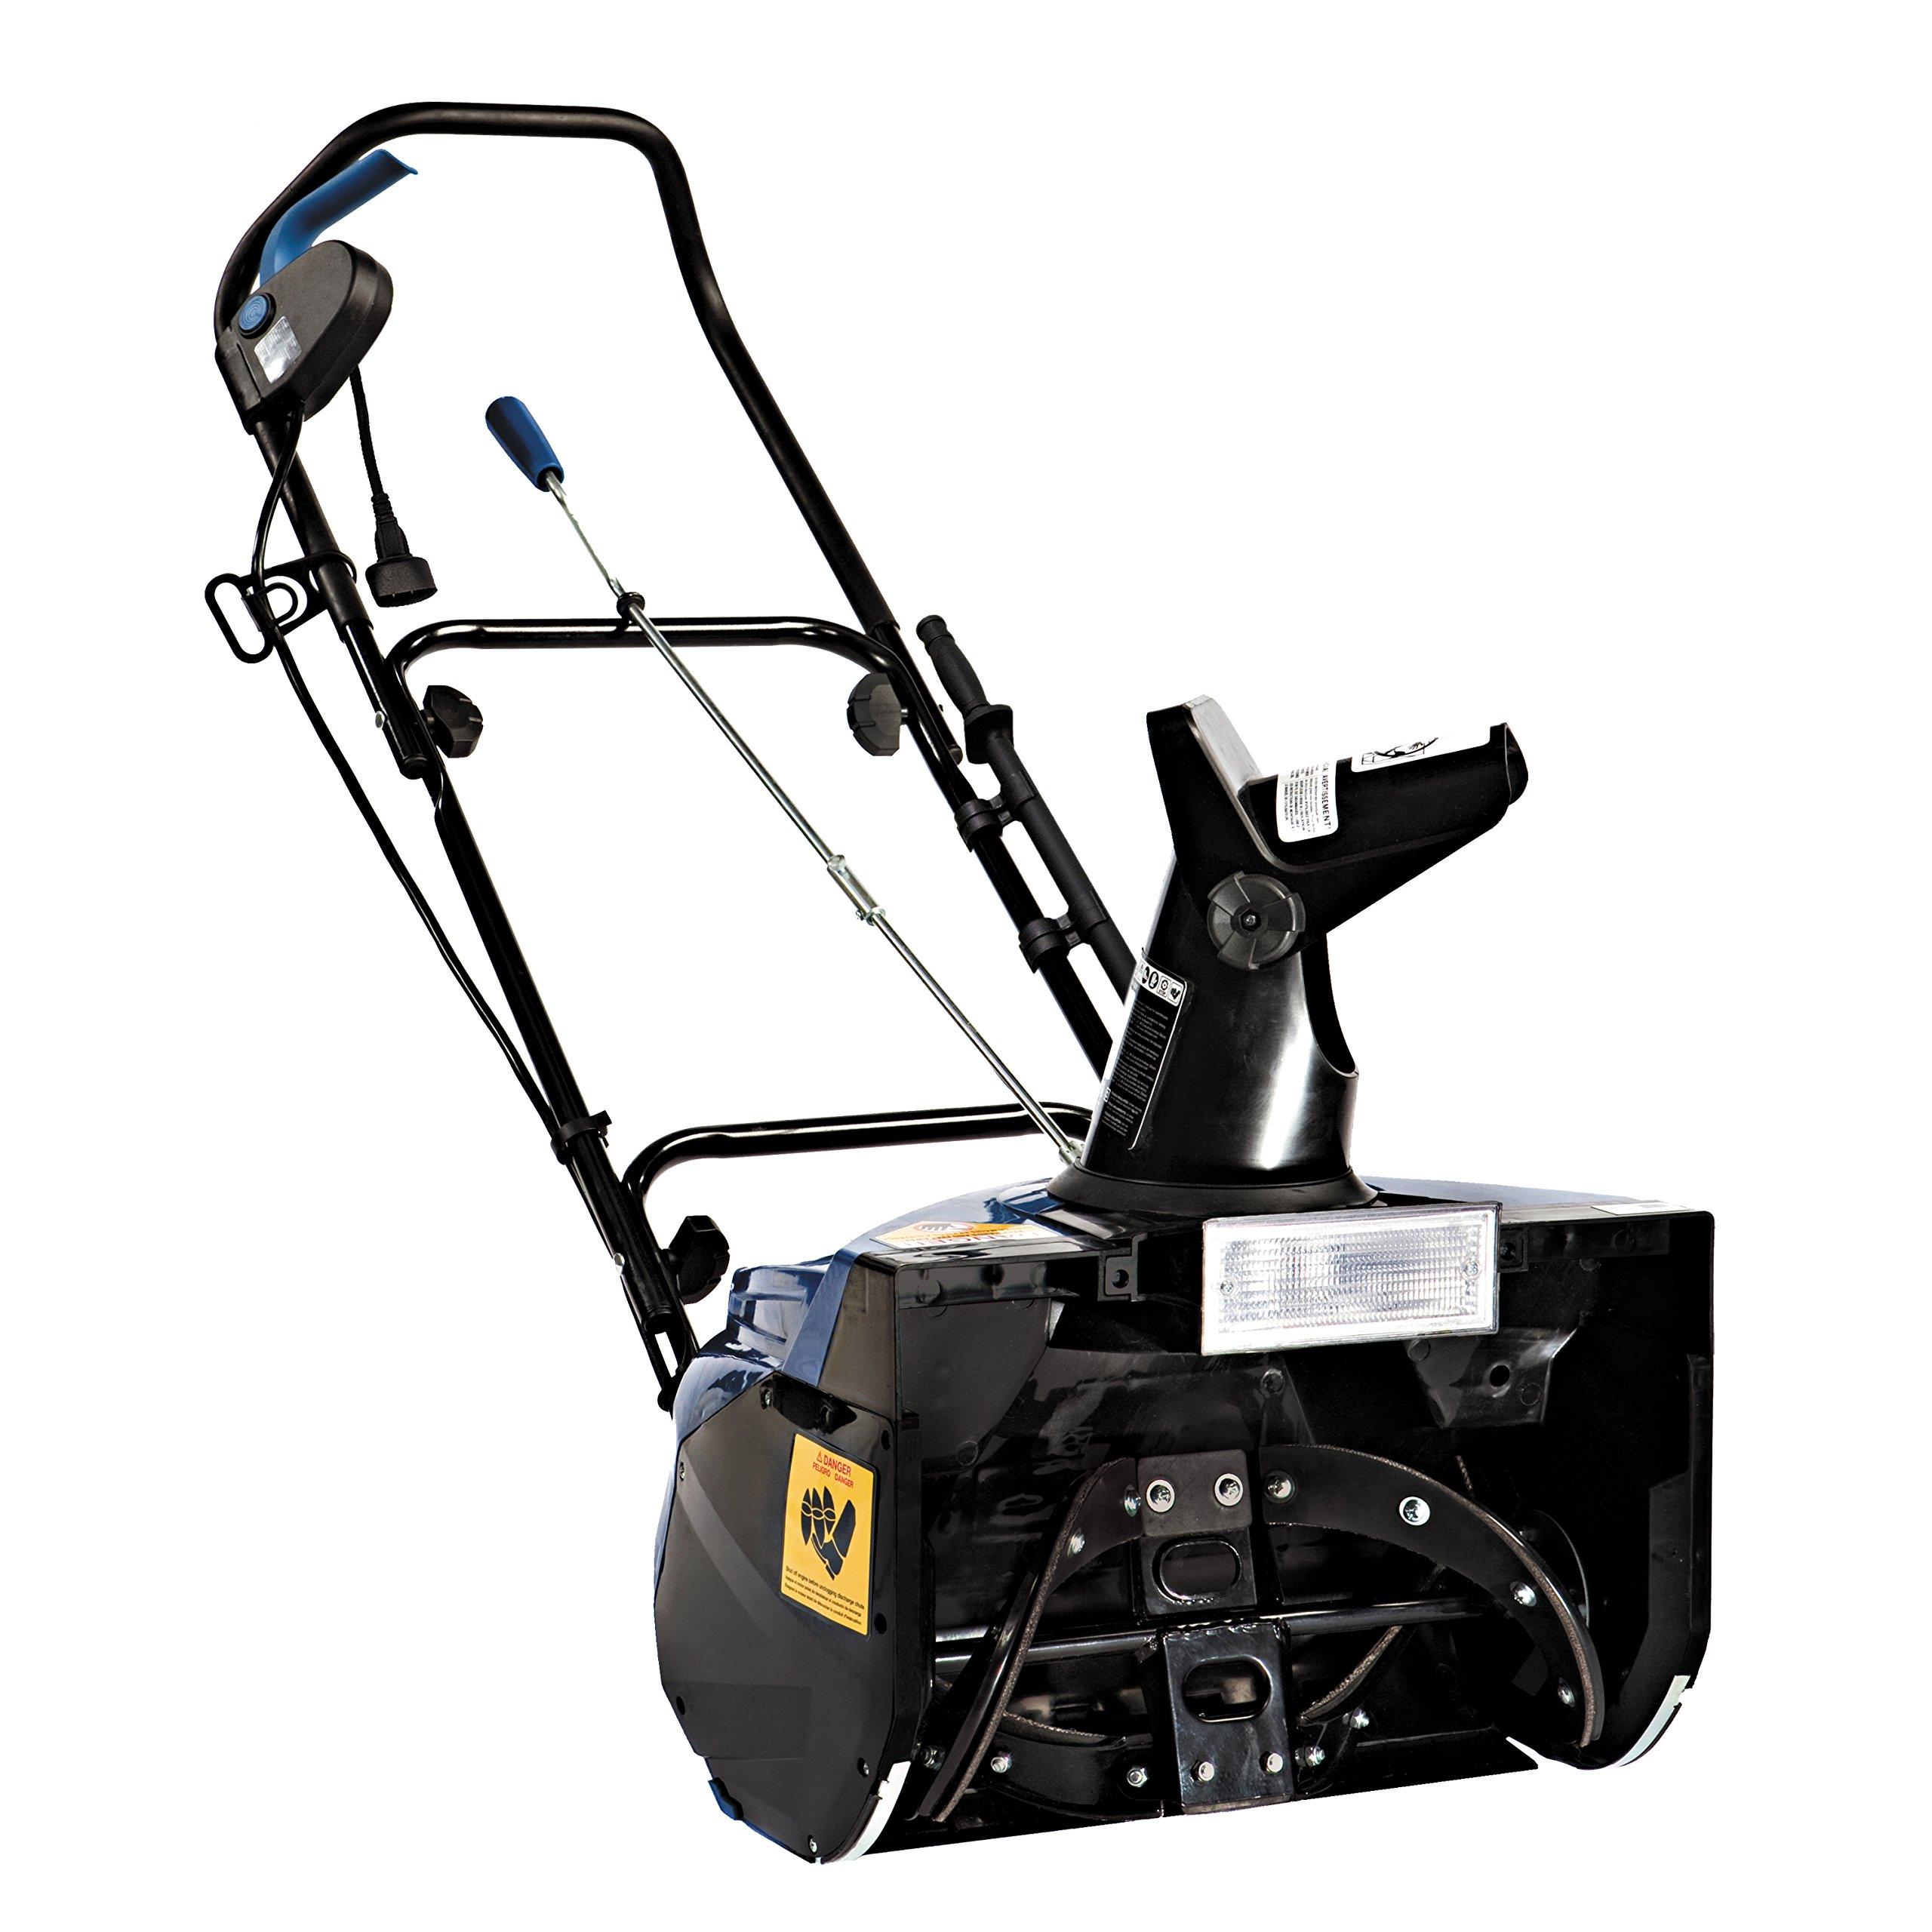 Snow Joe SJ623E-RM Electric Single Stage Snow Thrower | 18-Inch | 15 Amp Motor | Headlights (Renewed) by Snow Joe